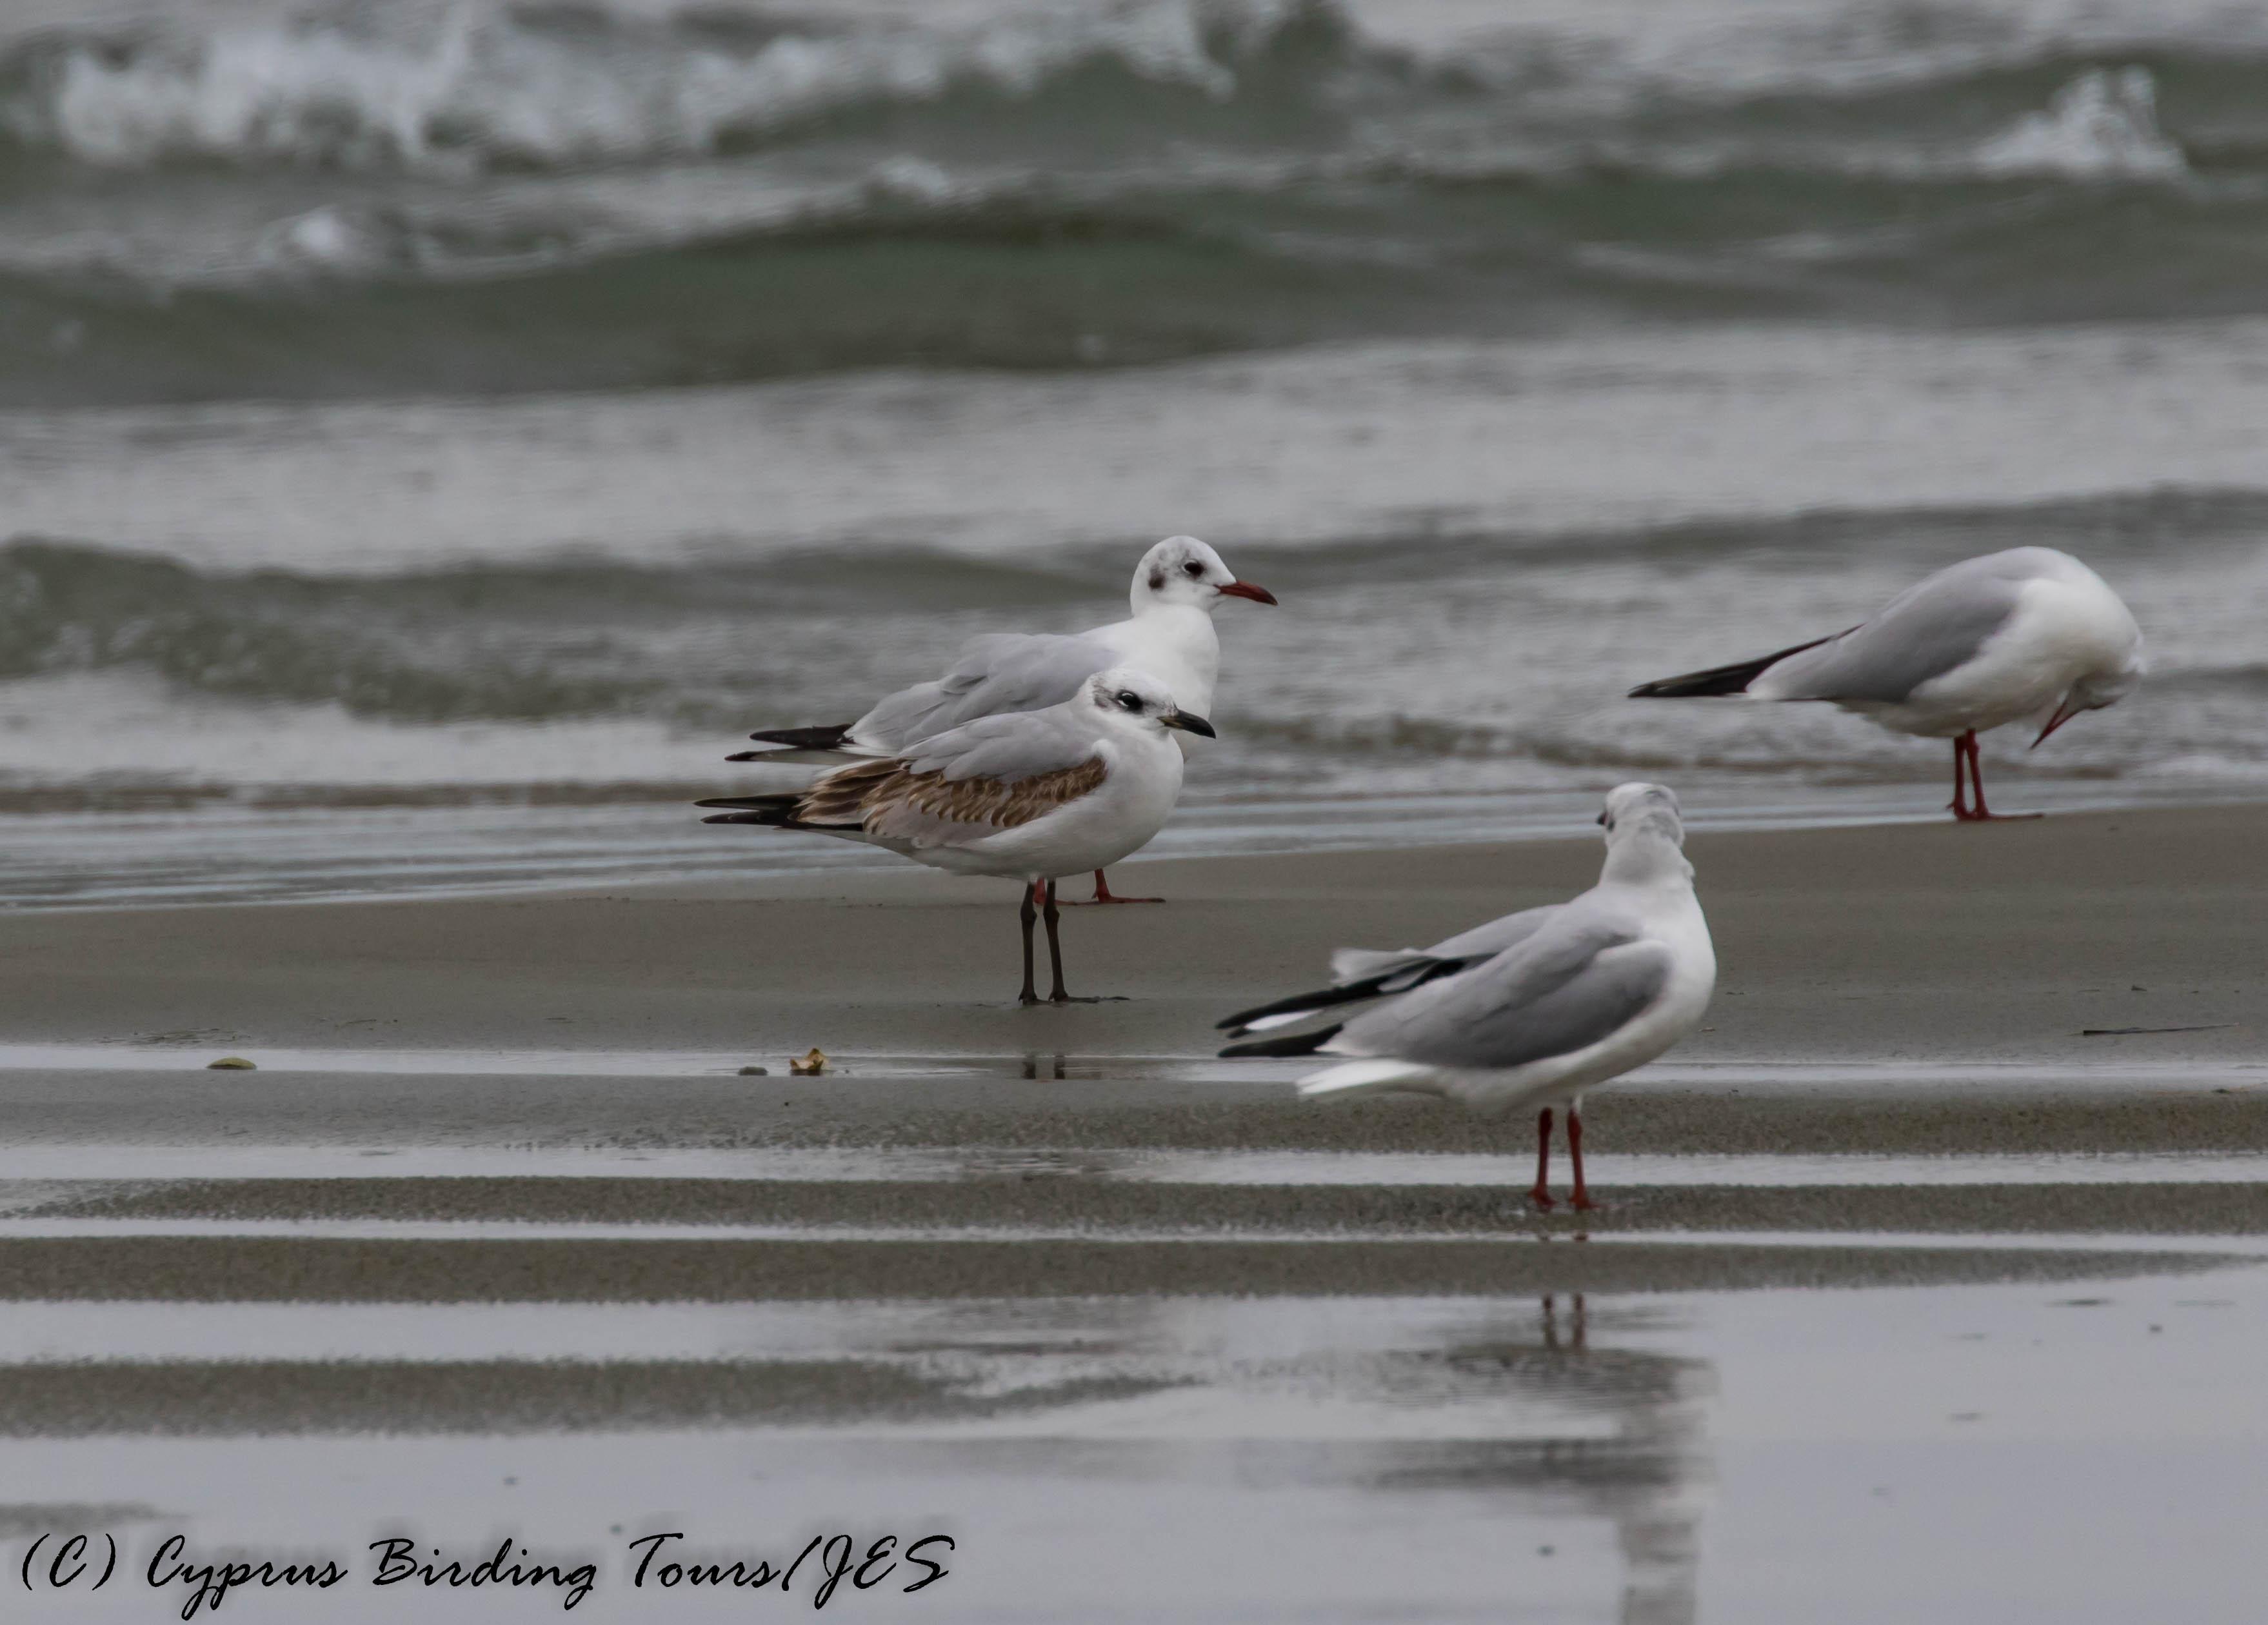 Mediterranean Gull, 1st winter, Oroklini Beach 8th January 2017 (c) Cyprus Birding Tours